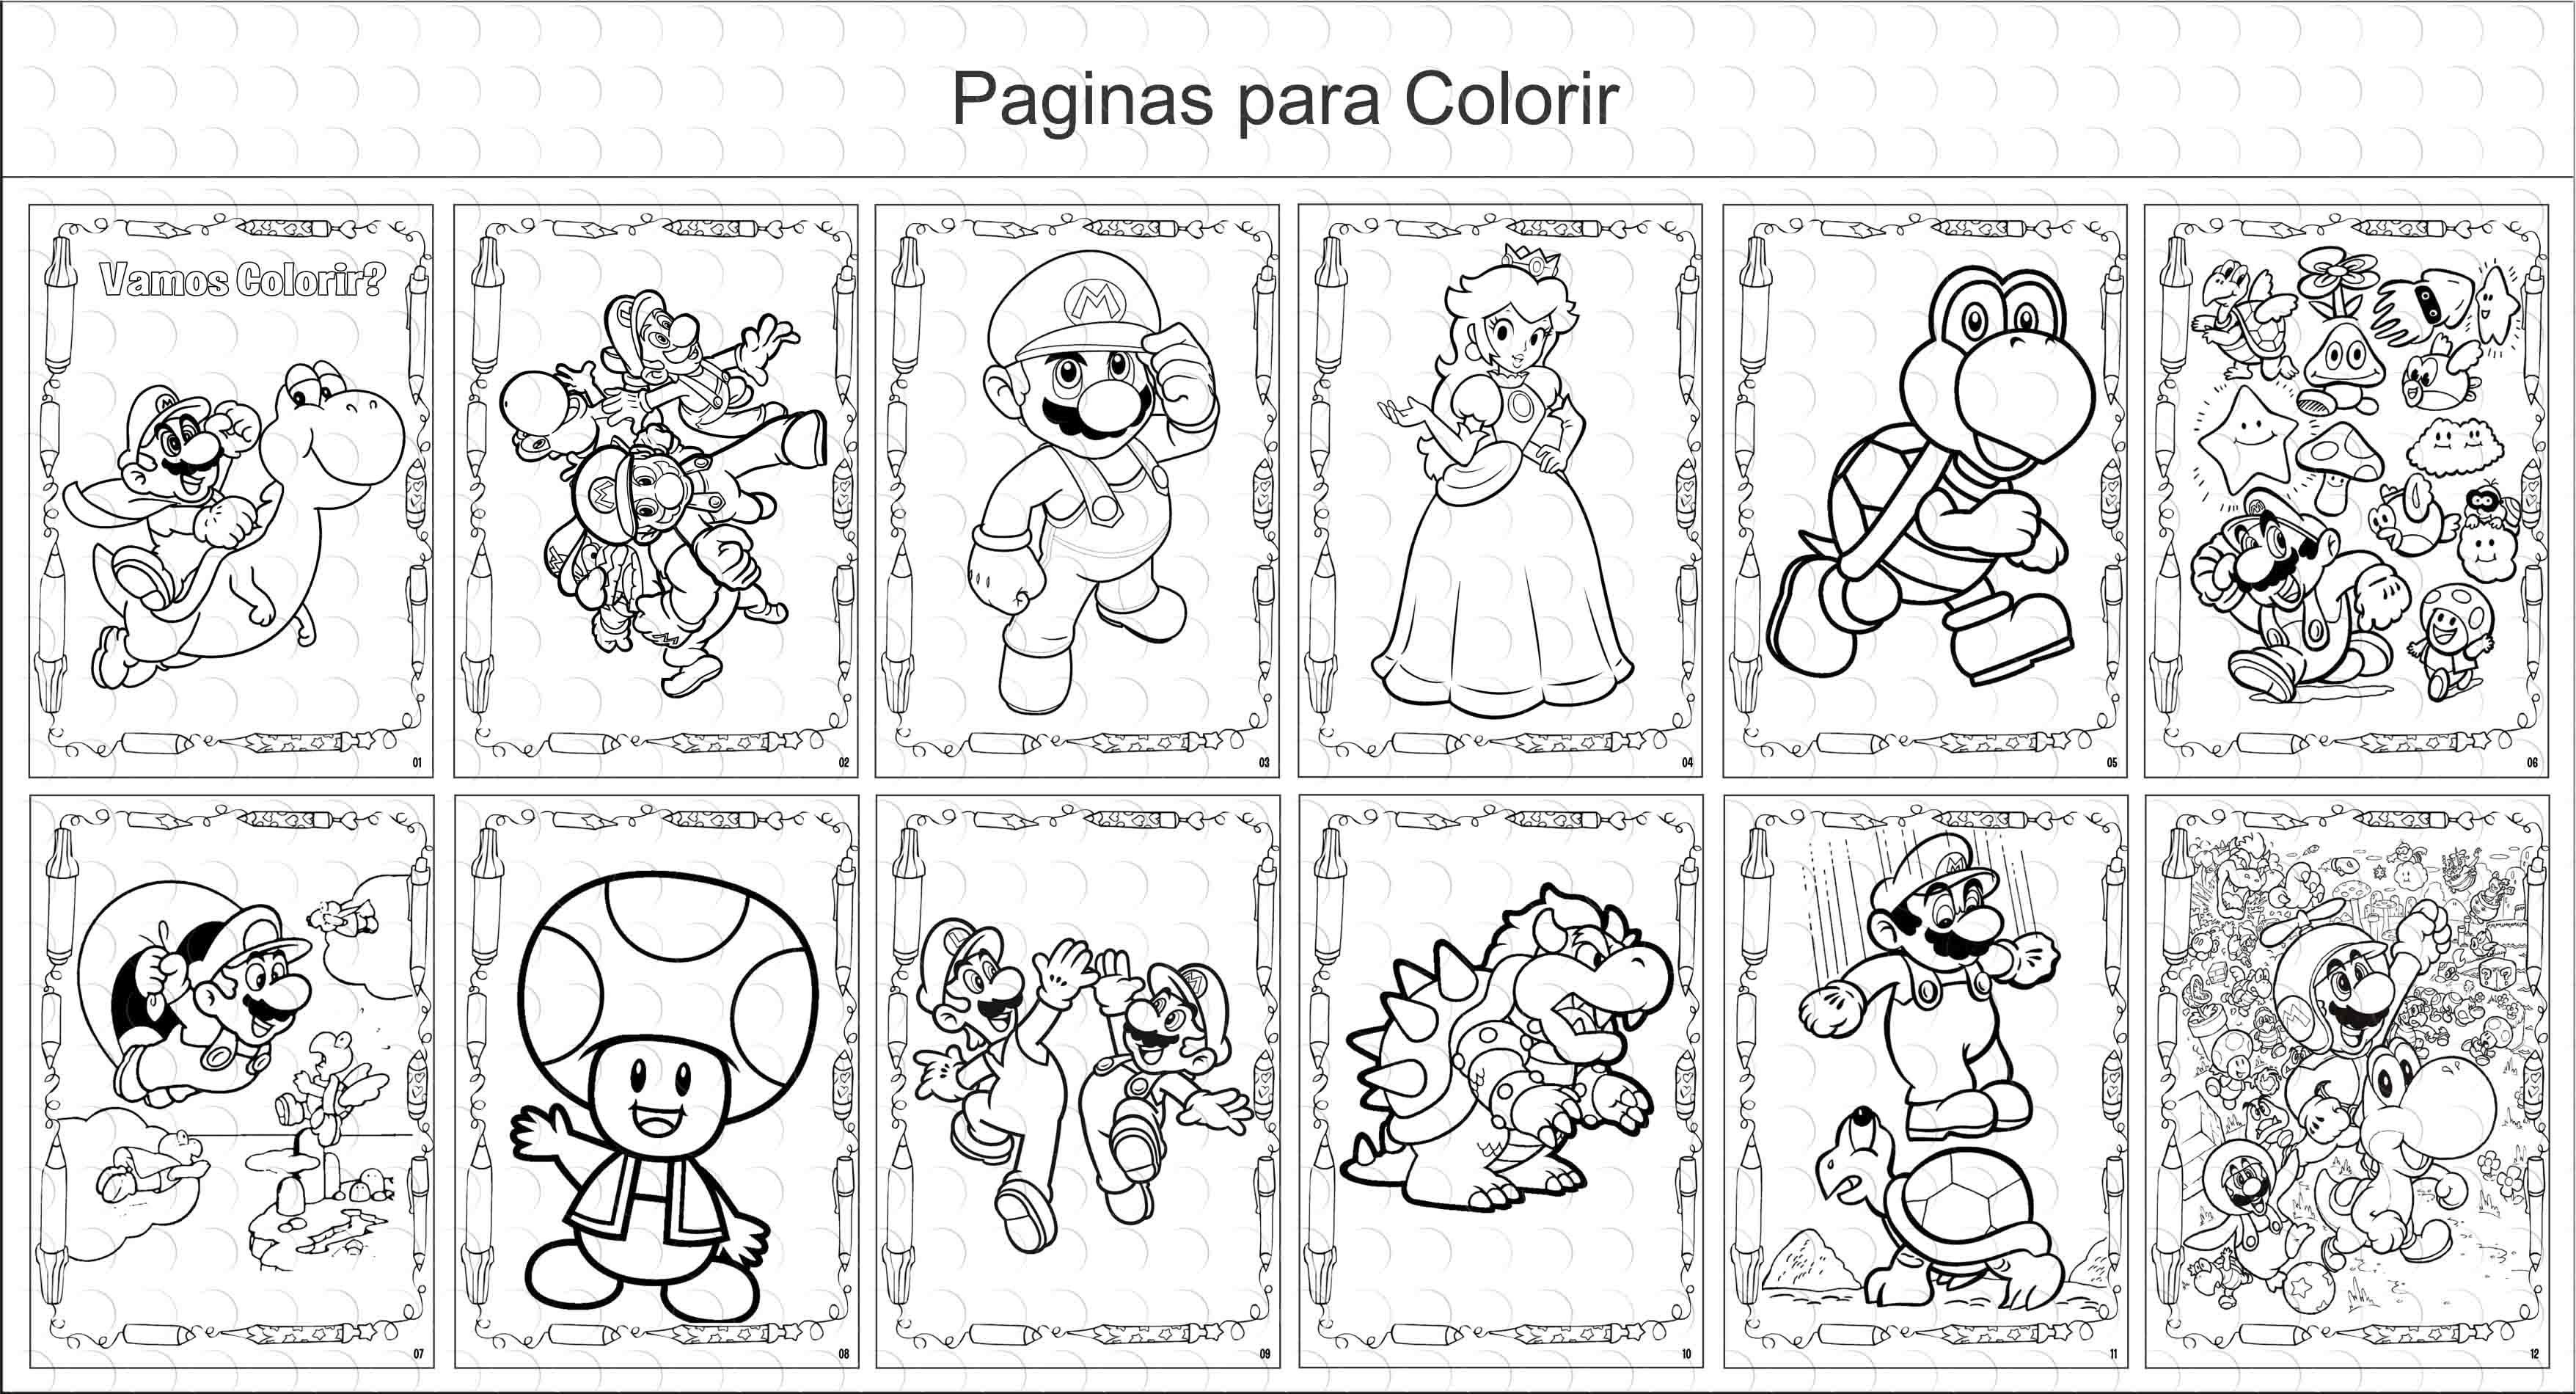 Livro De Colorir 10x15 Mario Bros No Elo7 G A Personalize Ace3a2